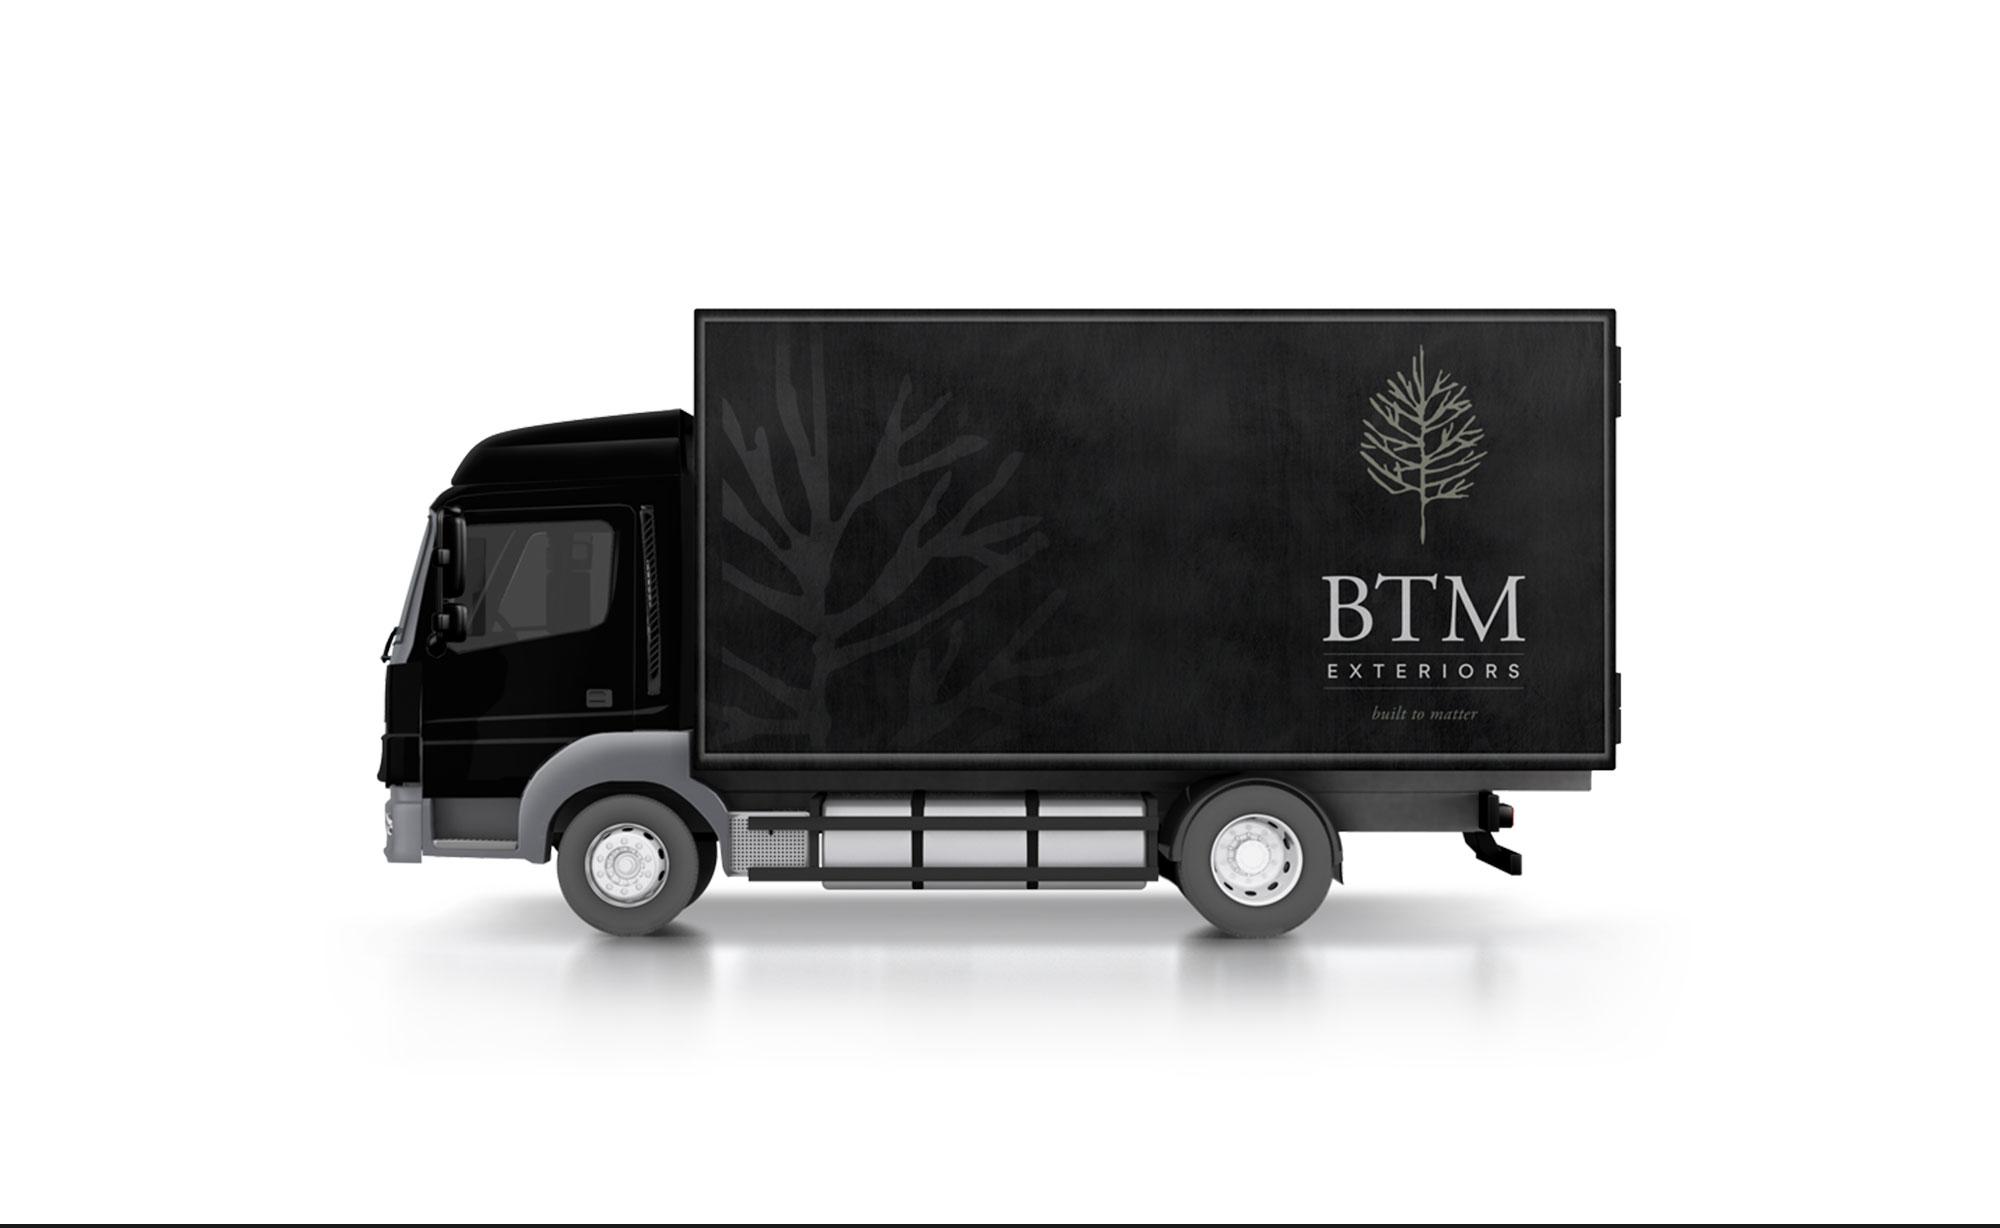 ©-Chris-Rae-Design-BTM-Exteriors-Vehicle-Truck-Design-03.jpg